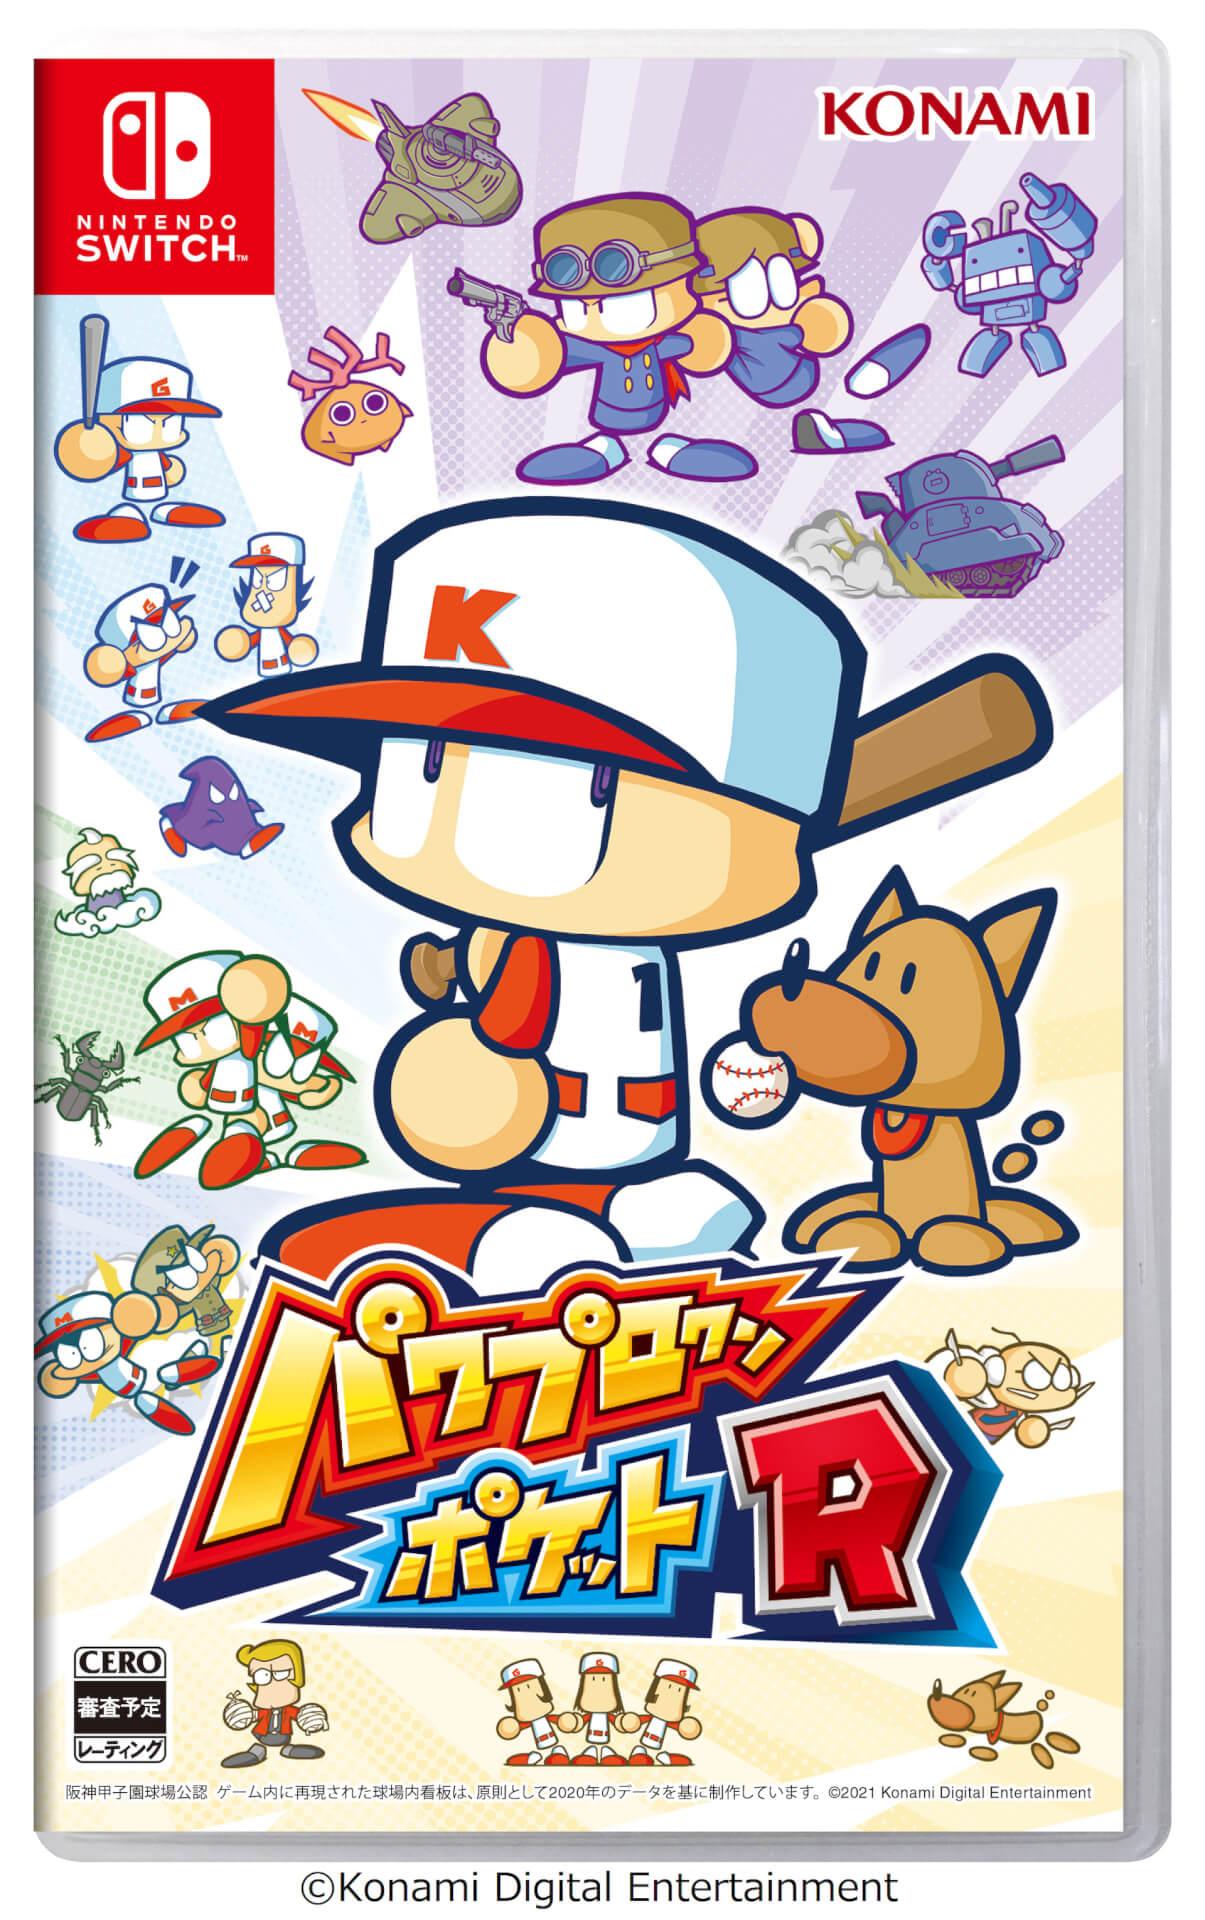 Nintendo Switch『パワプロクンポケットR』の発売日が11月25日に決定!DLCパワポケダッシュも早期購入特典に tech210805_pawapoker_15